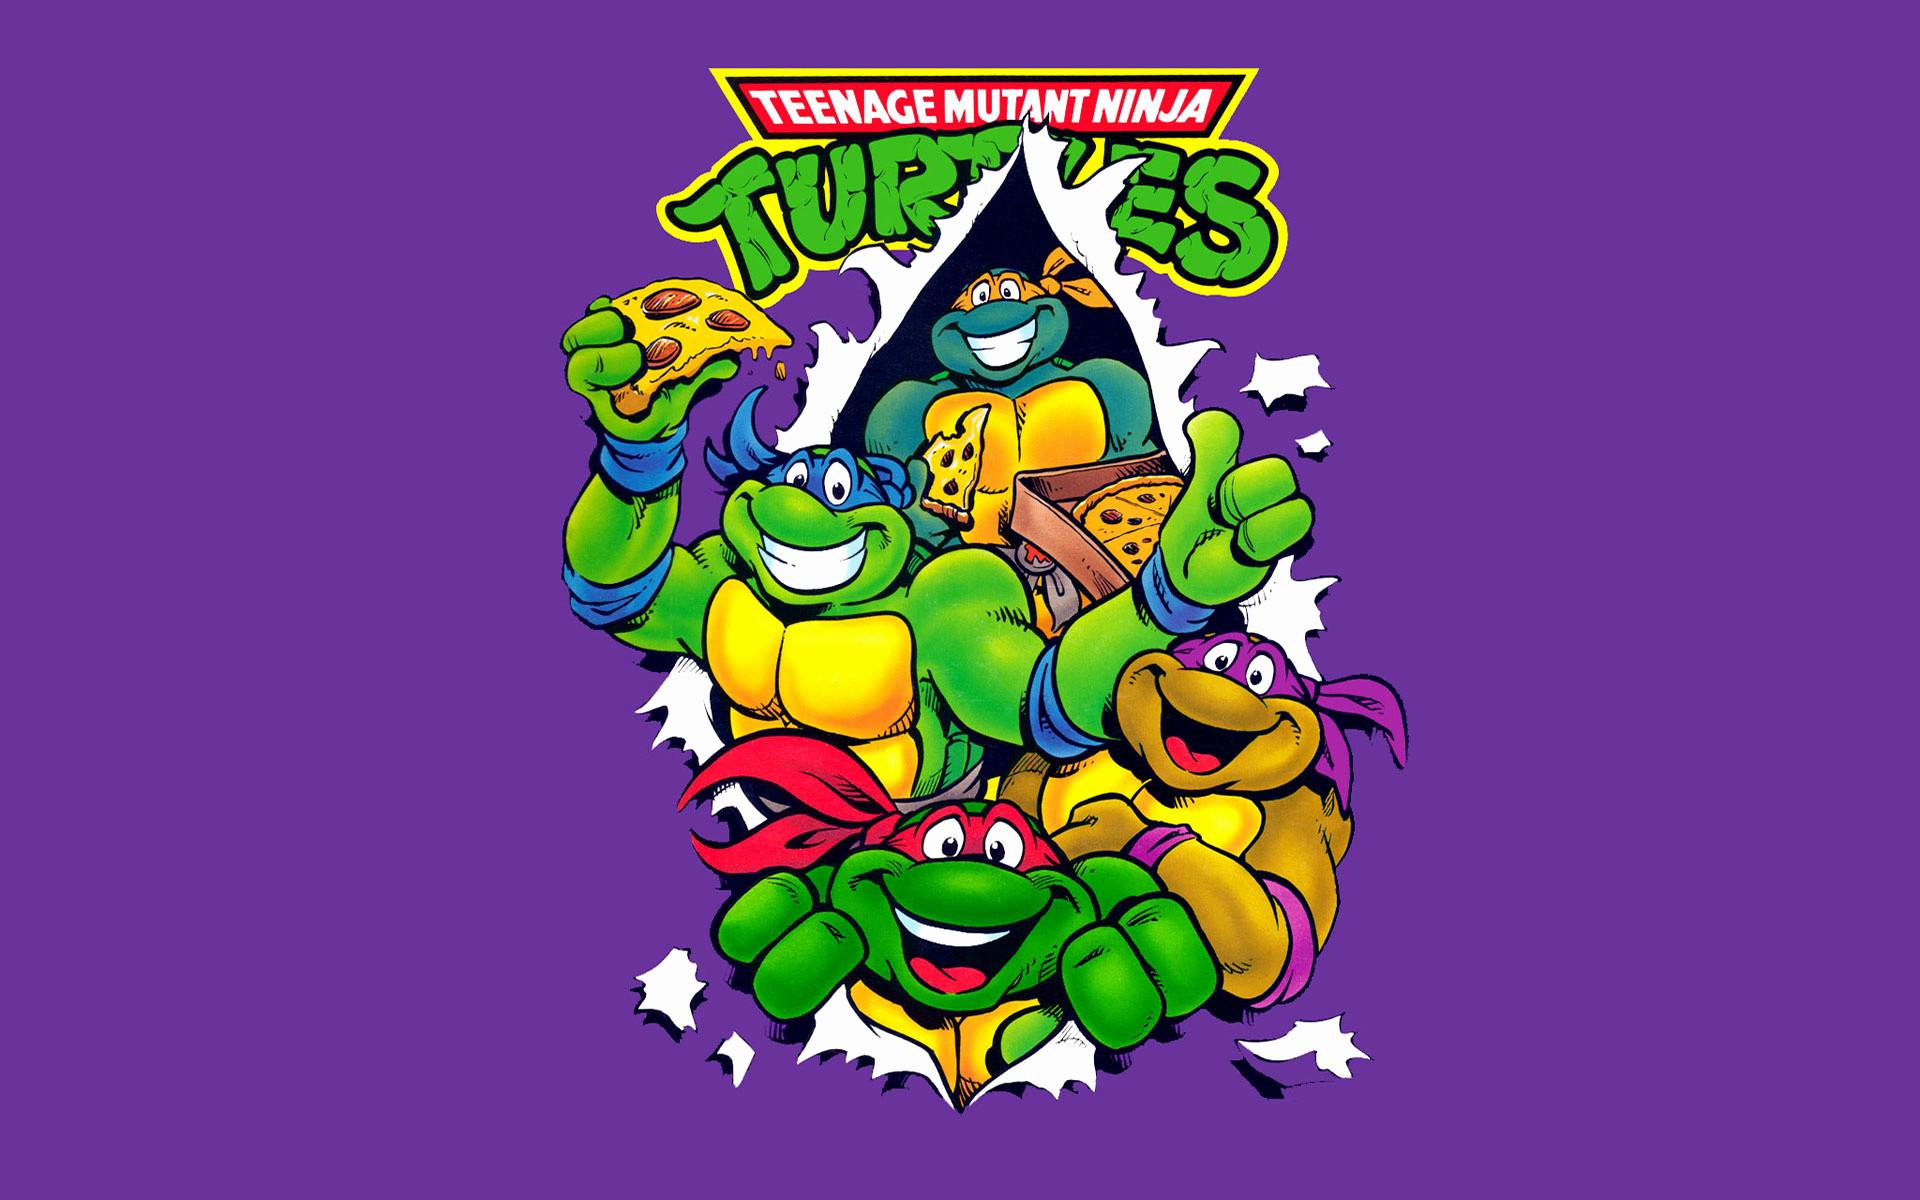 Res: 1920x1200, Teenage Mutant Ninja Turtles Wallpaper Fresh Cute Ninja Wallpaper Impremedia